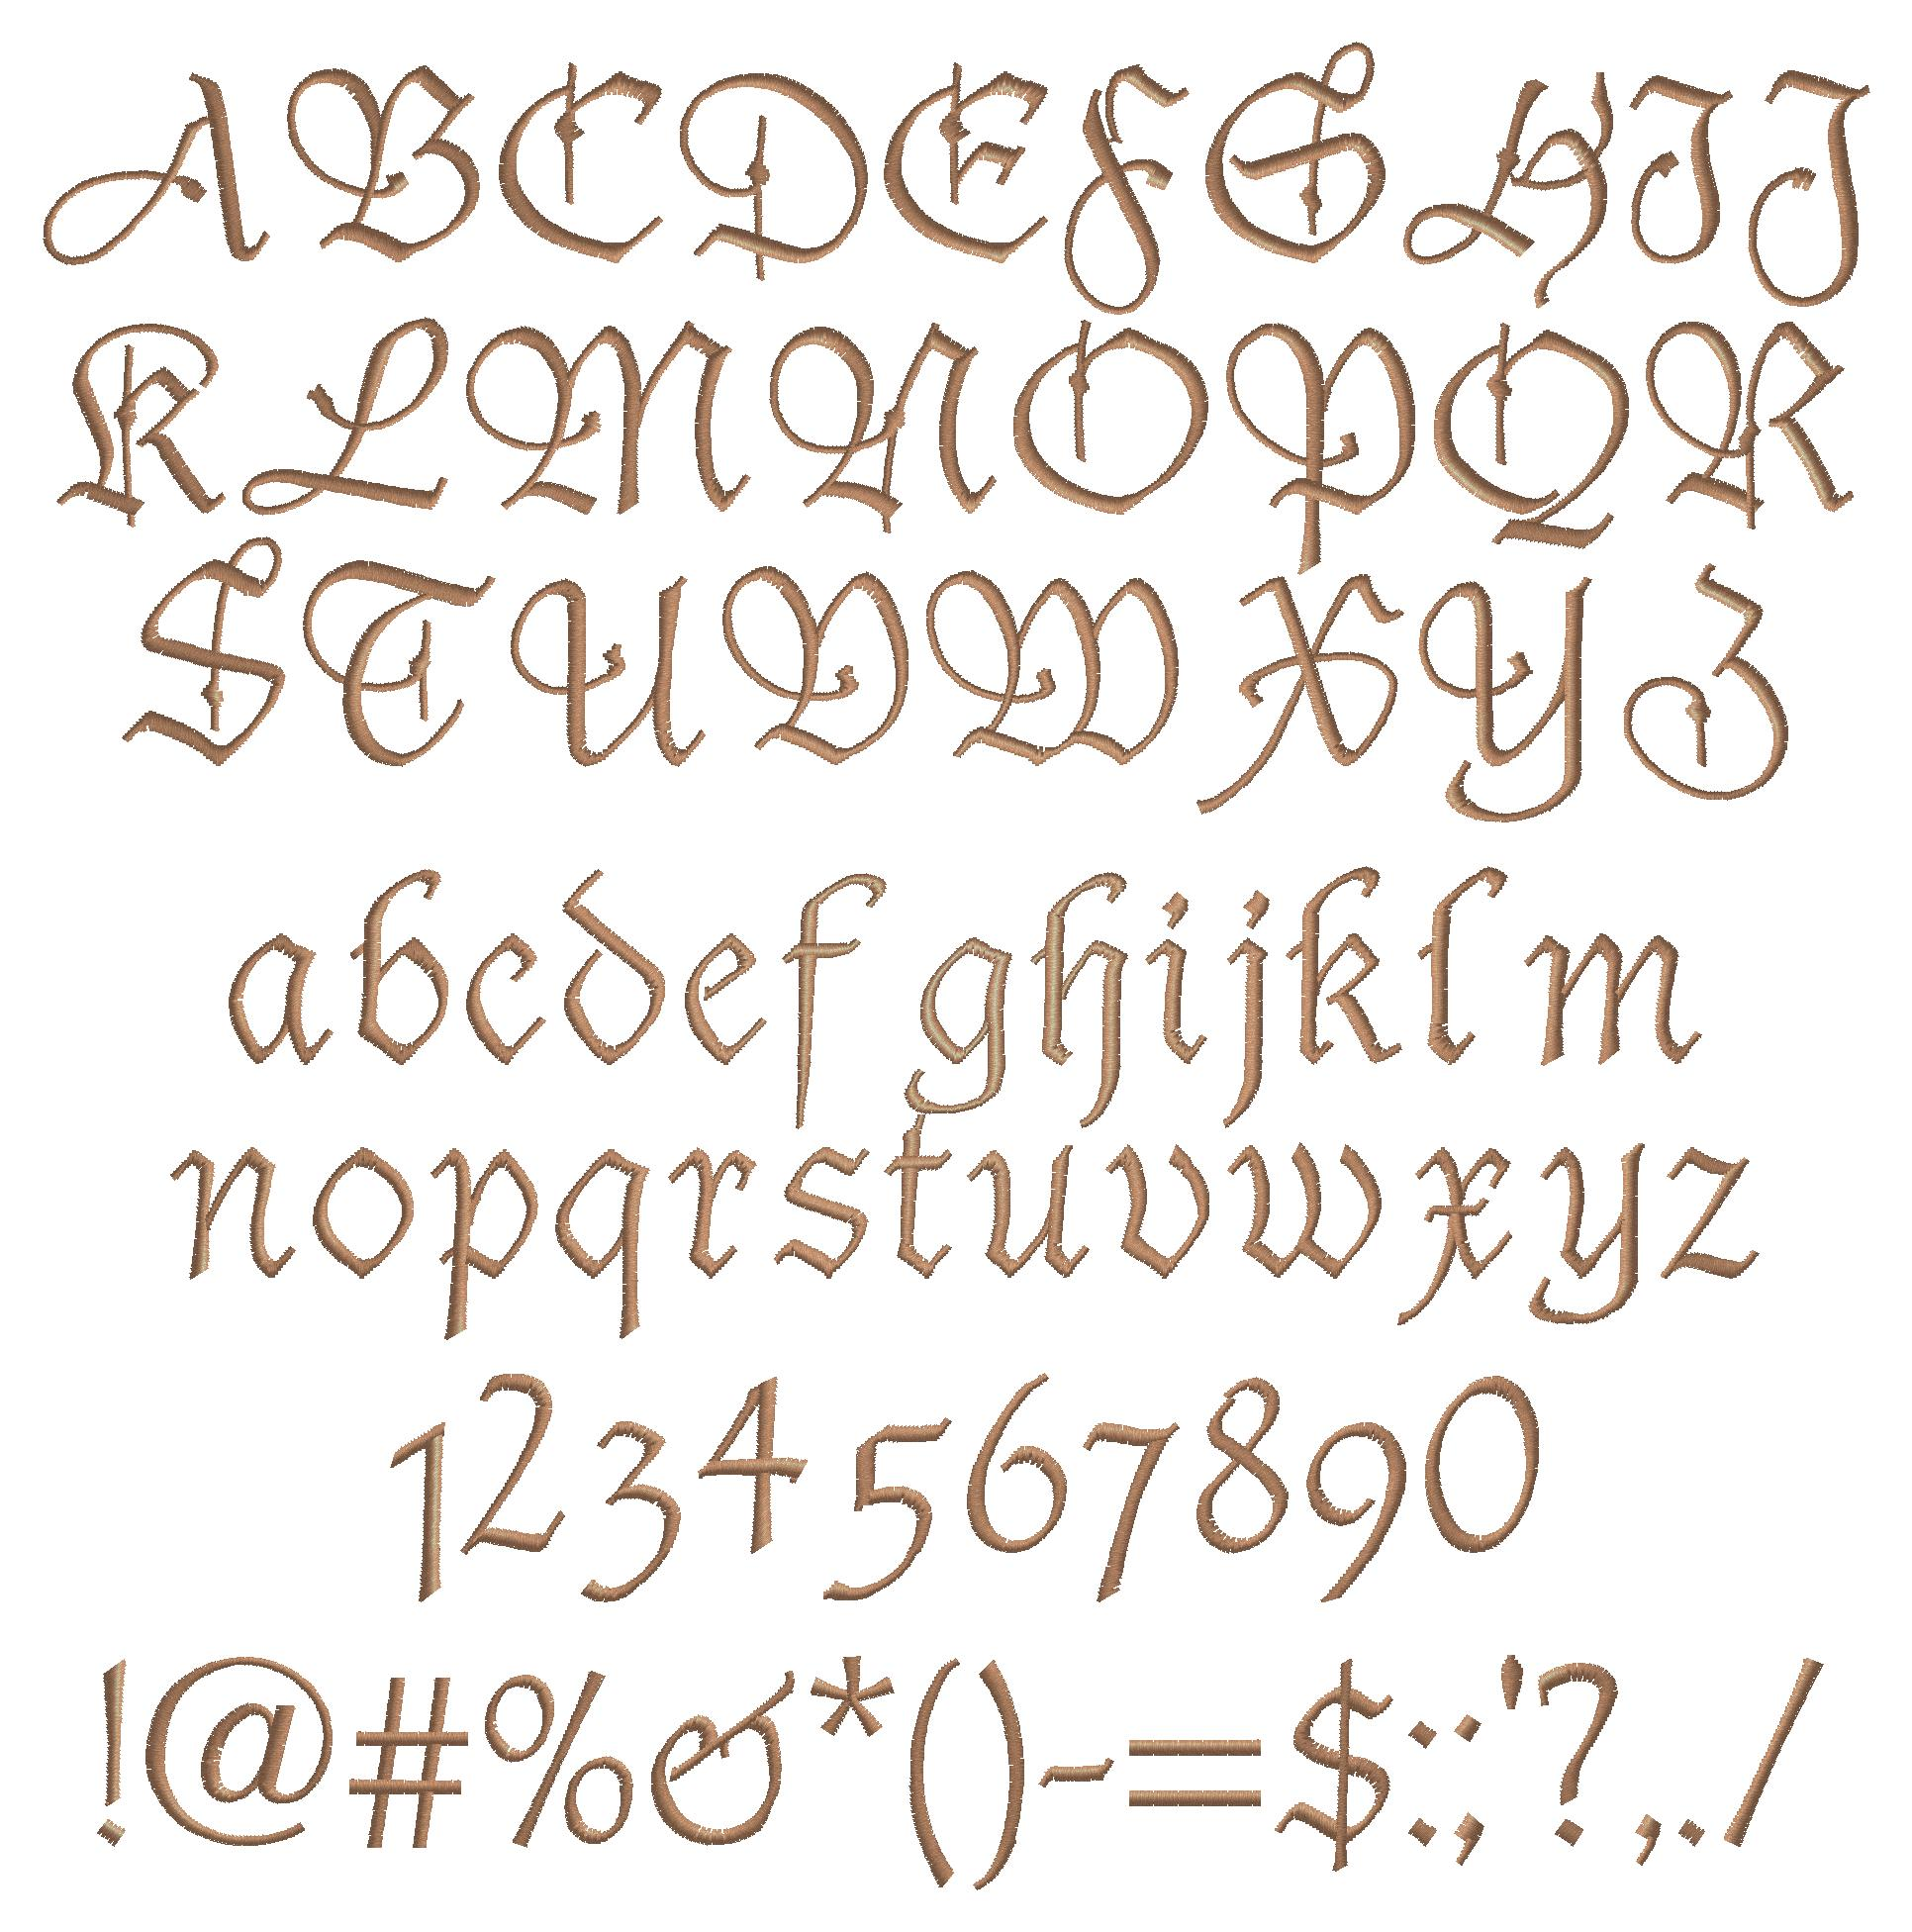 Tudor ScriptFancy Script Lettering Alphabet